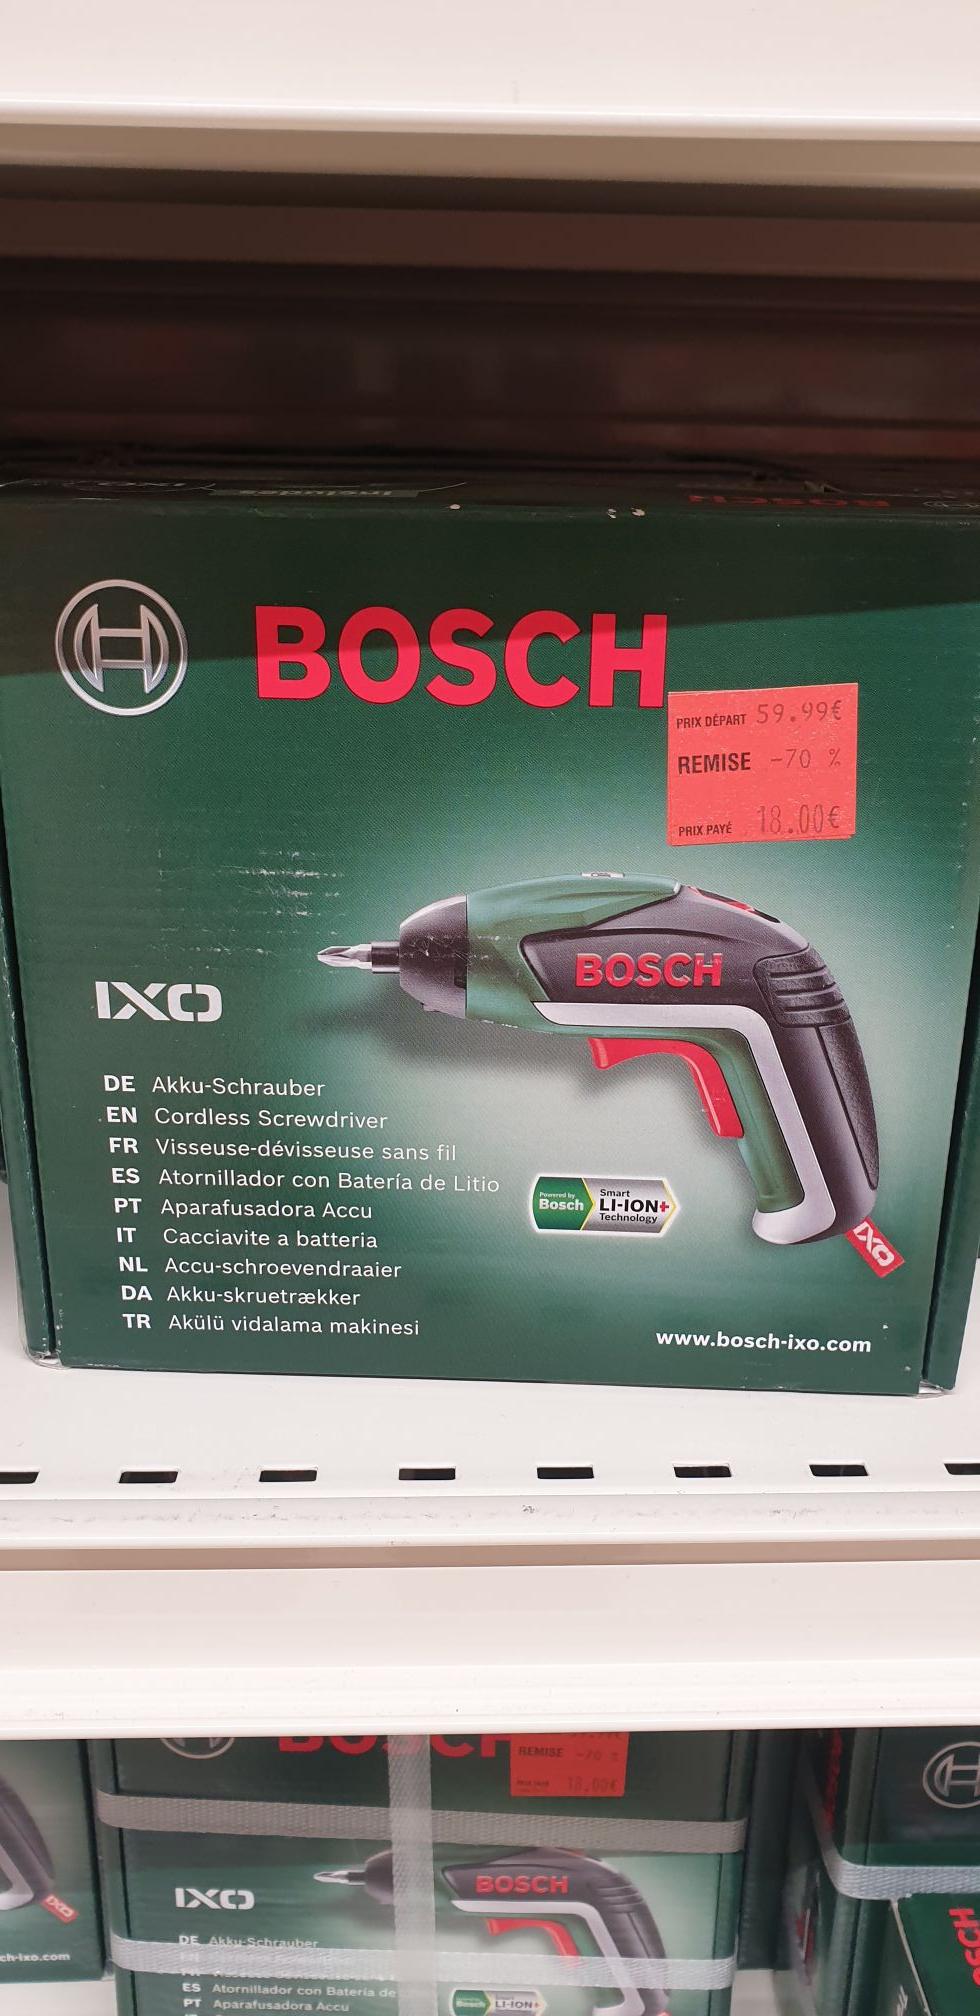 Visseuse sans-fil Bosch IXO - Chelles (77)